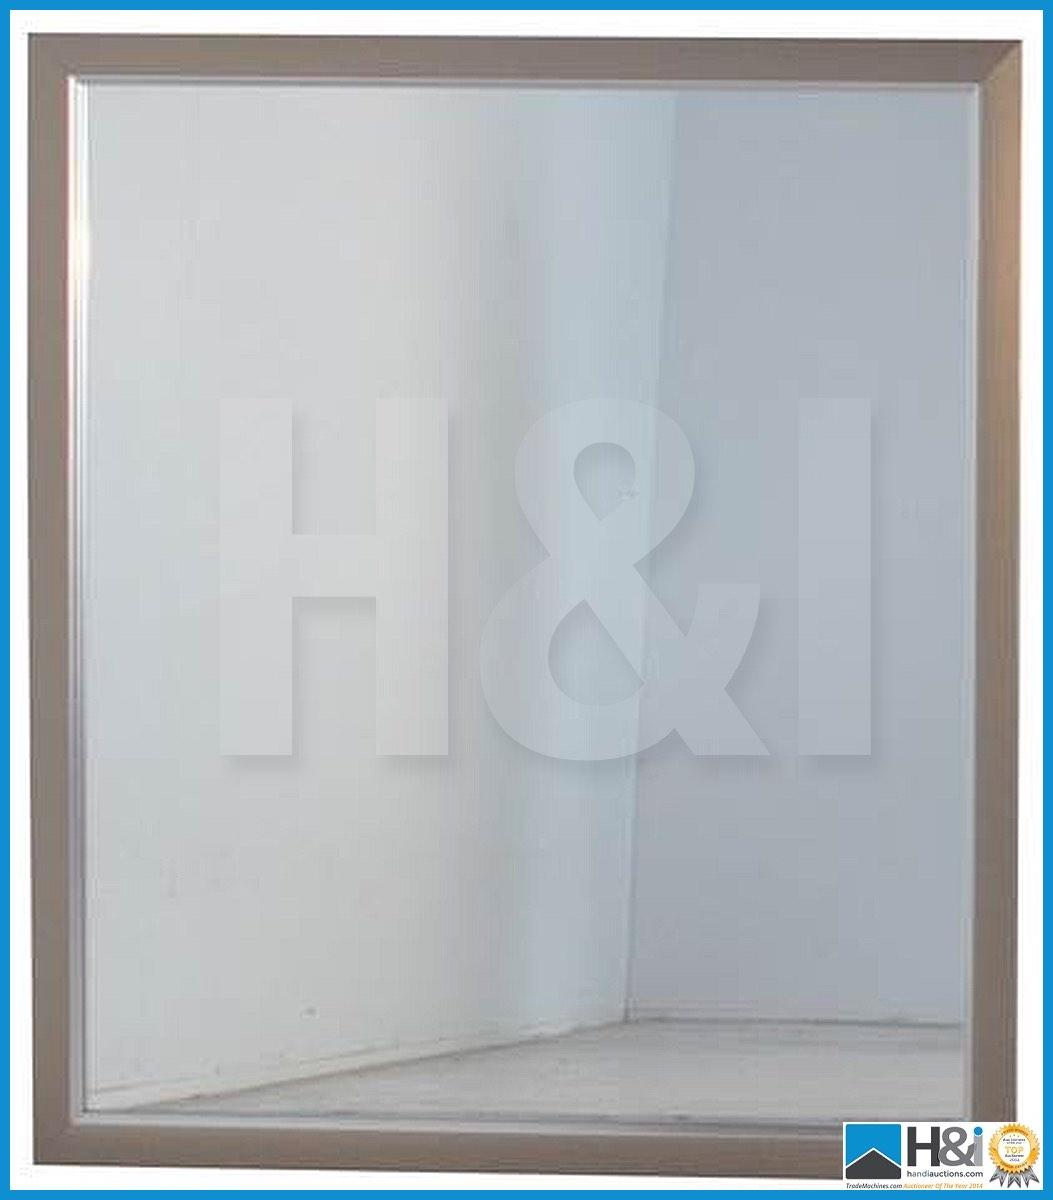 Lot 14 - Stunning black walnut bedroom furniture set comprising: 2-door wardrobe - H 193cm x W 110cm